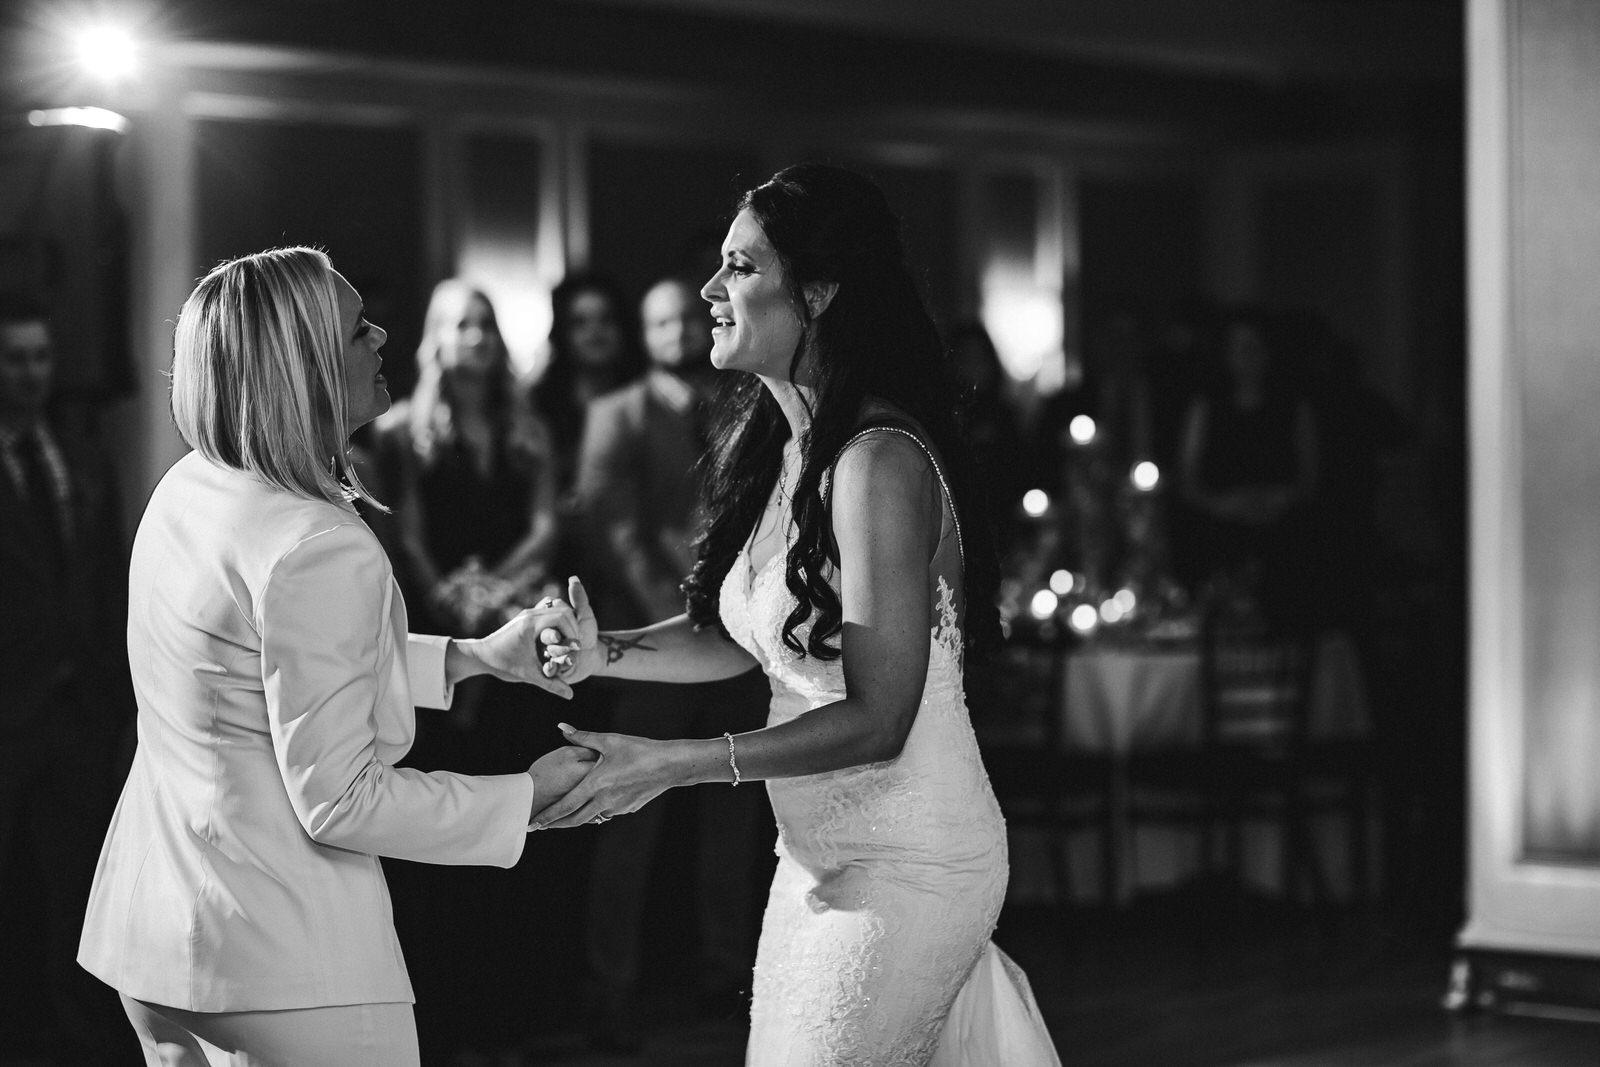 first_dance_brides_lgbtq_weddings_tiny_house_photo_south_florida_weddings.jpg